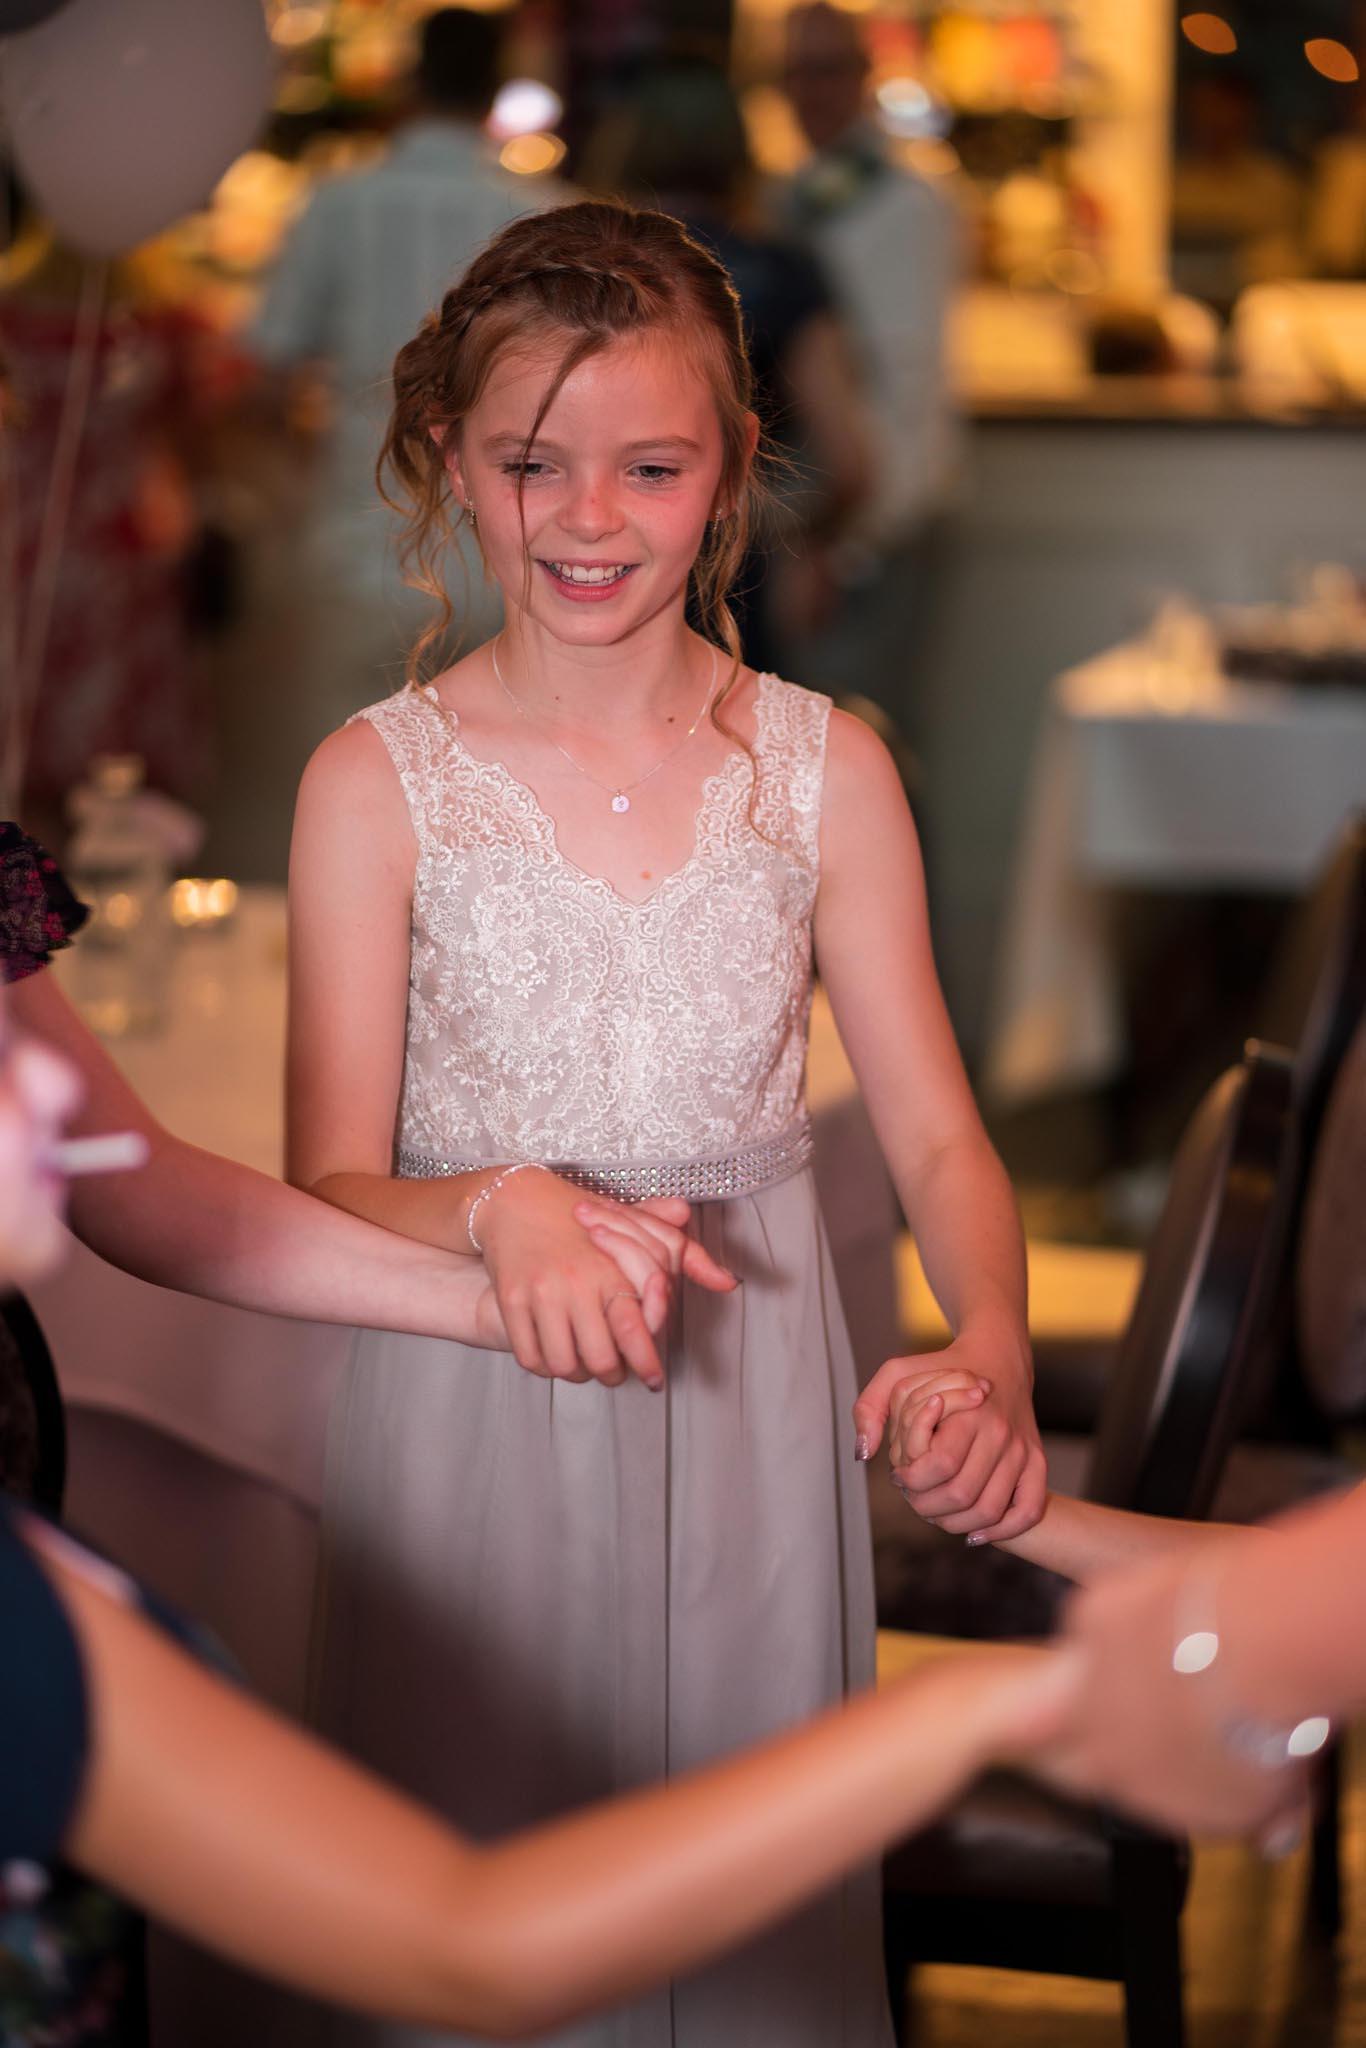 961-Night-Reception-Luke-Yasmin-The-Rayleigh-Club-Wedding-Photography.jpg